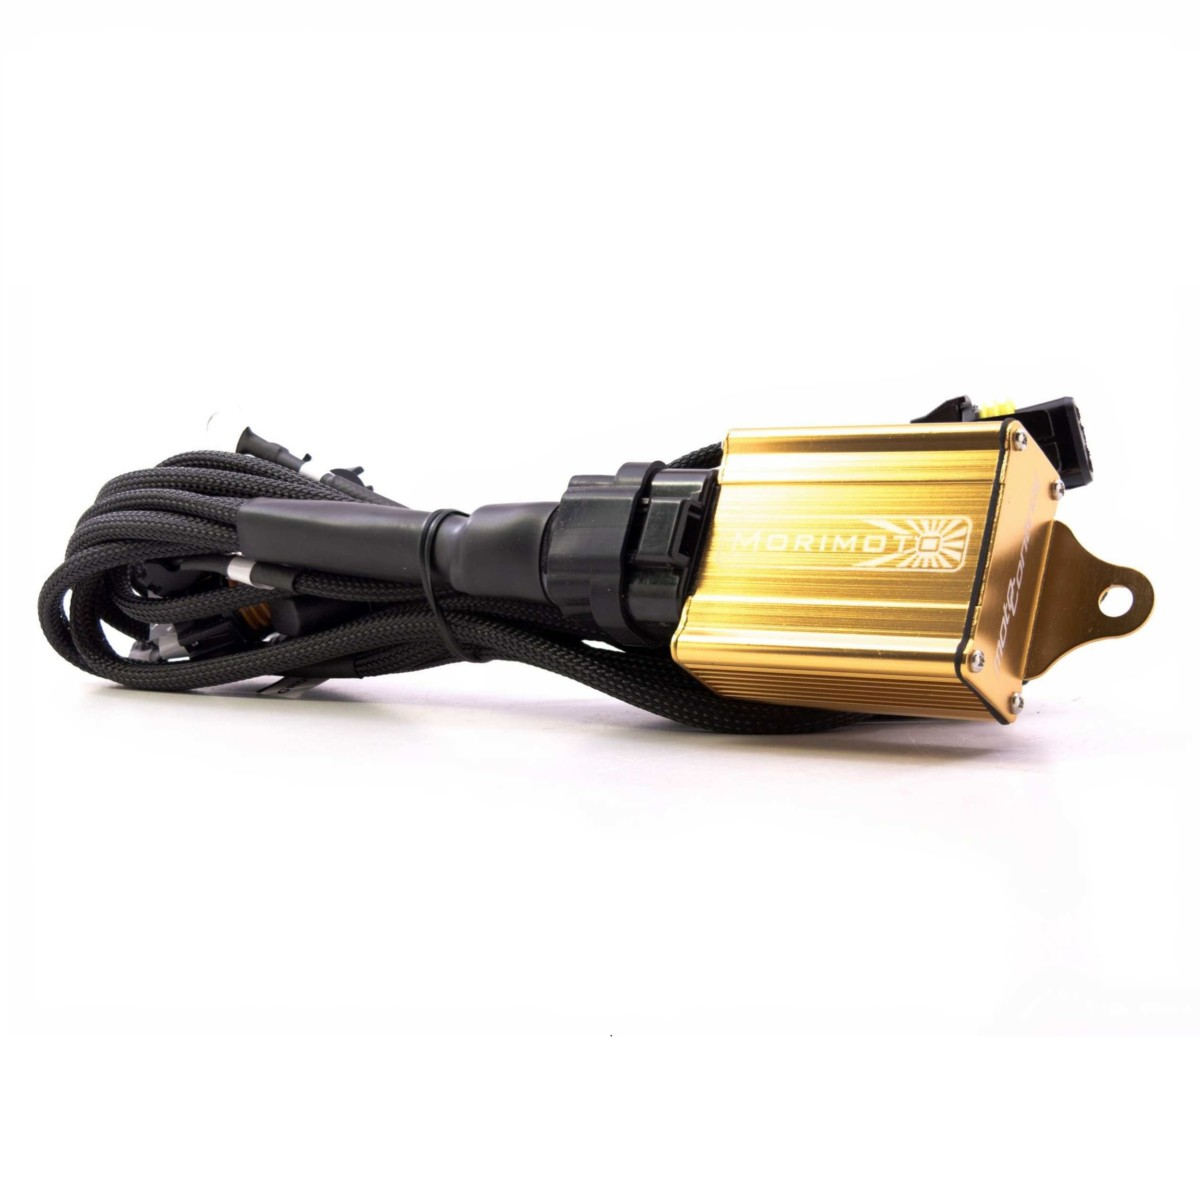 Morimoto H4 9003 Hi Lo Bi Xenon Wiring Harness Hid Kit Pros Testing Equipment